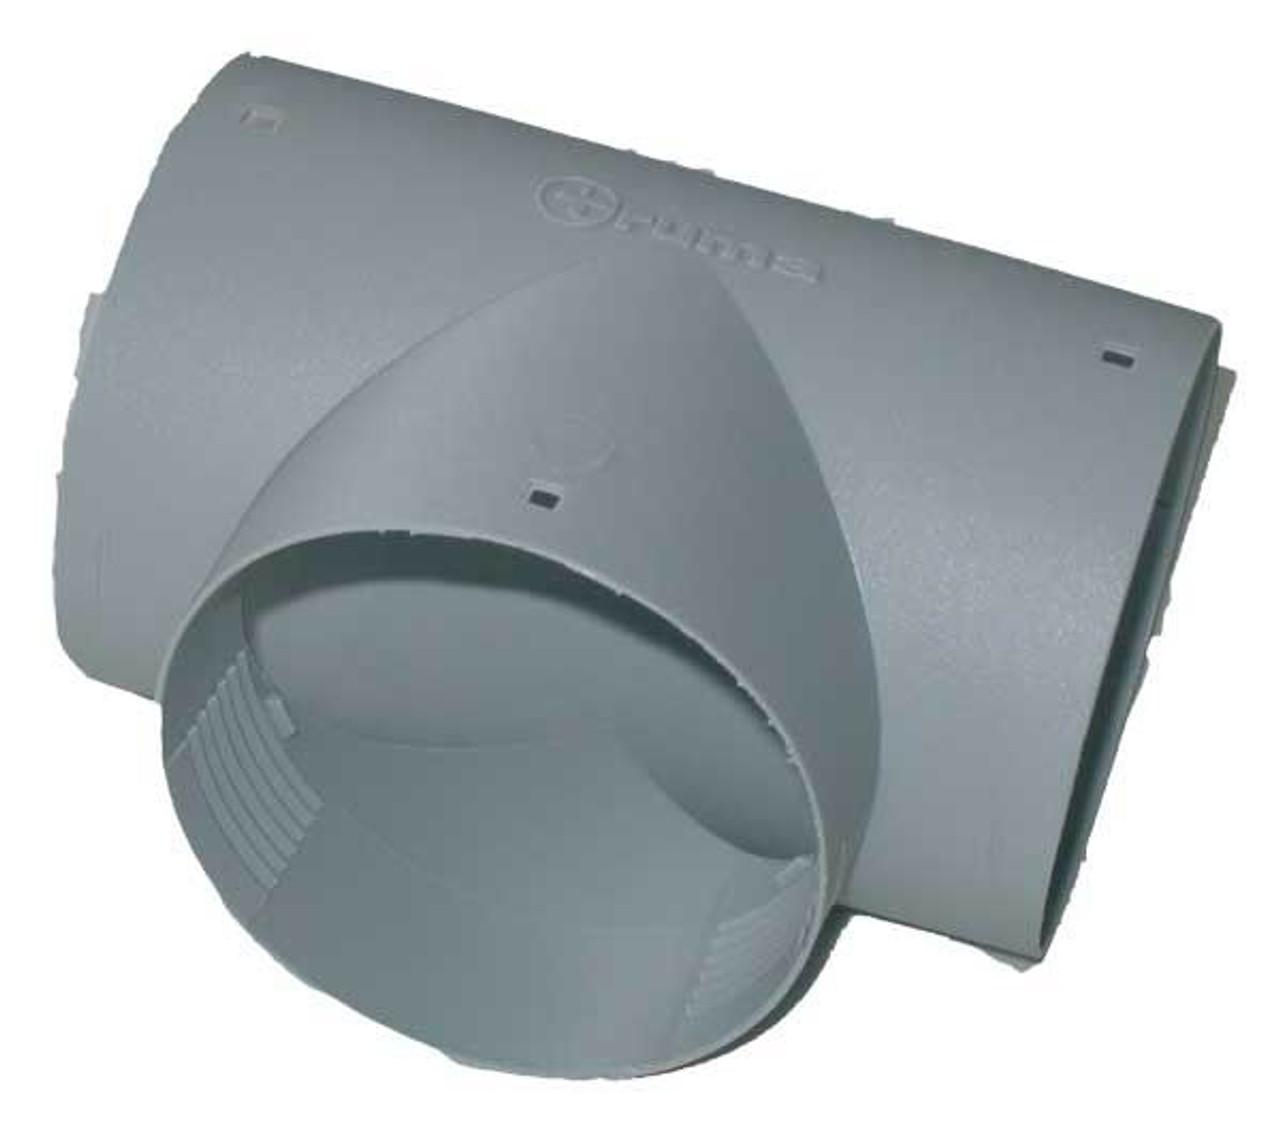 Truma T-Pipe TS Ducting Fitting (40151-51)